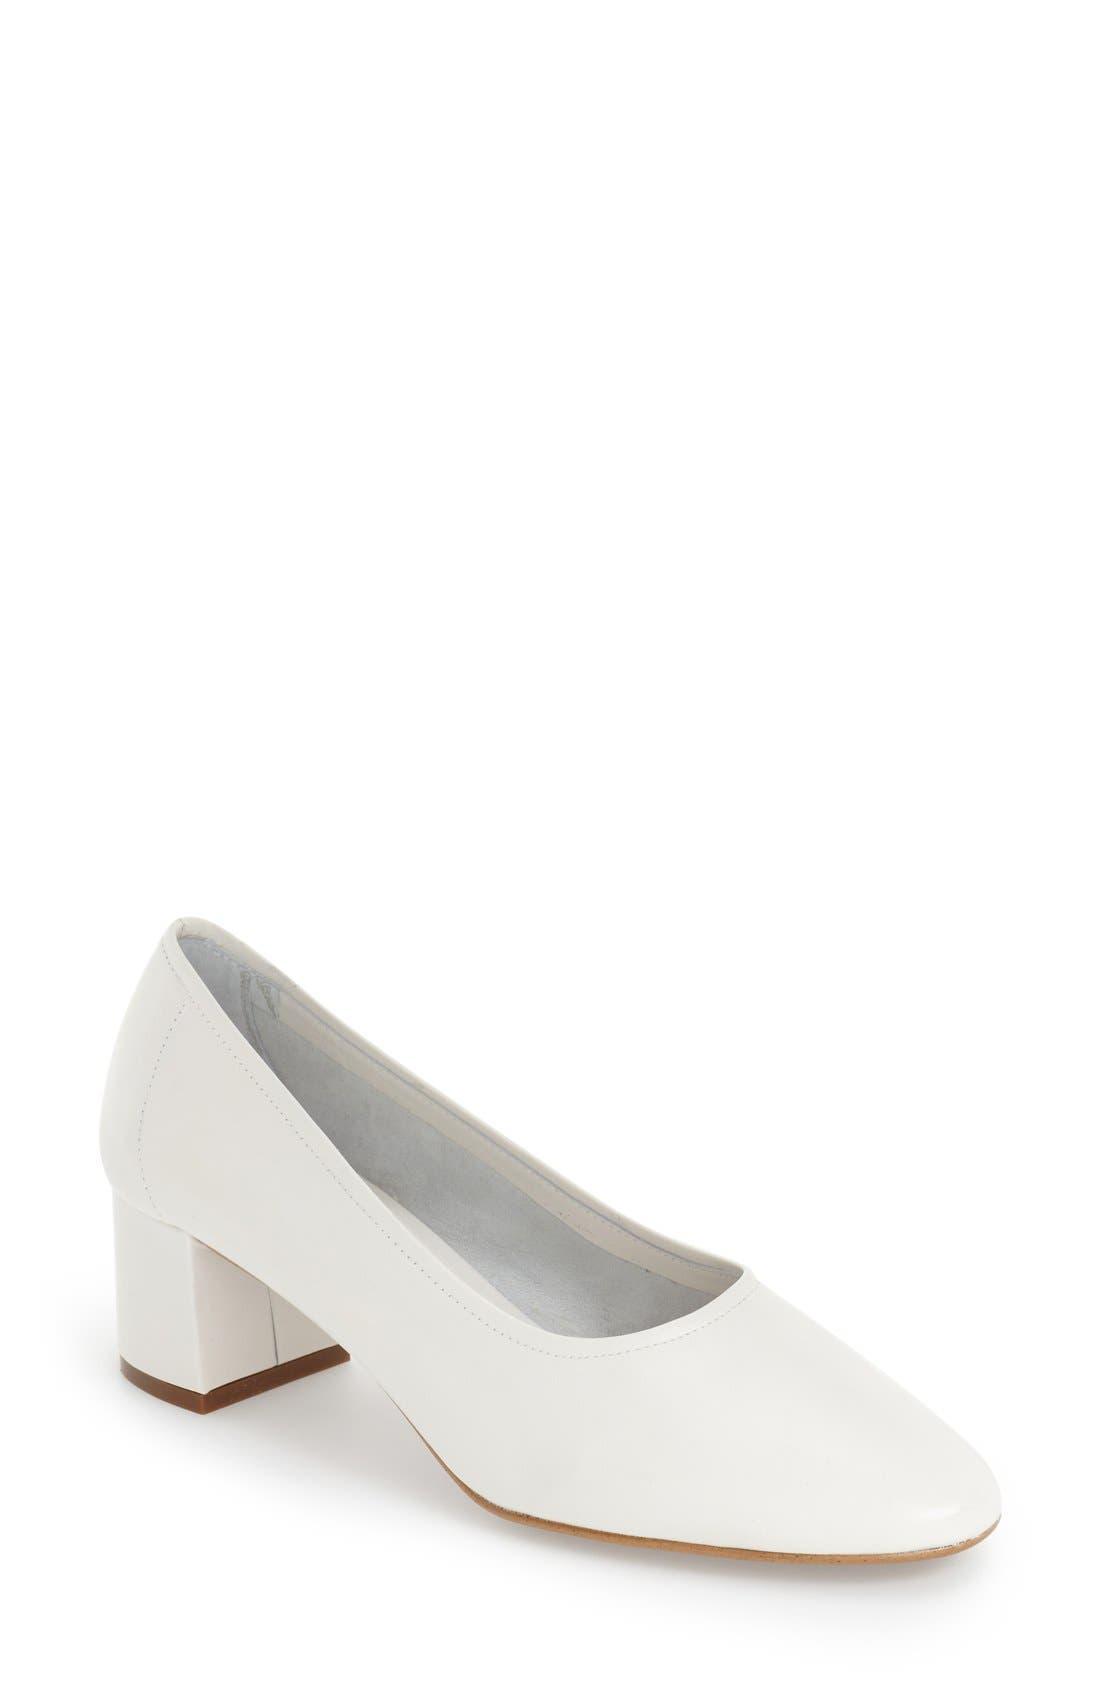 'Juno' Ballet Shoe,                             Main thumbnail 5, color,